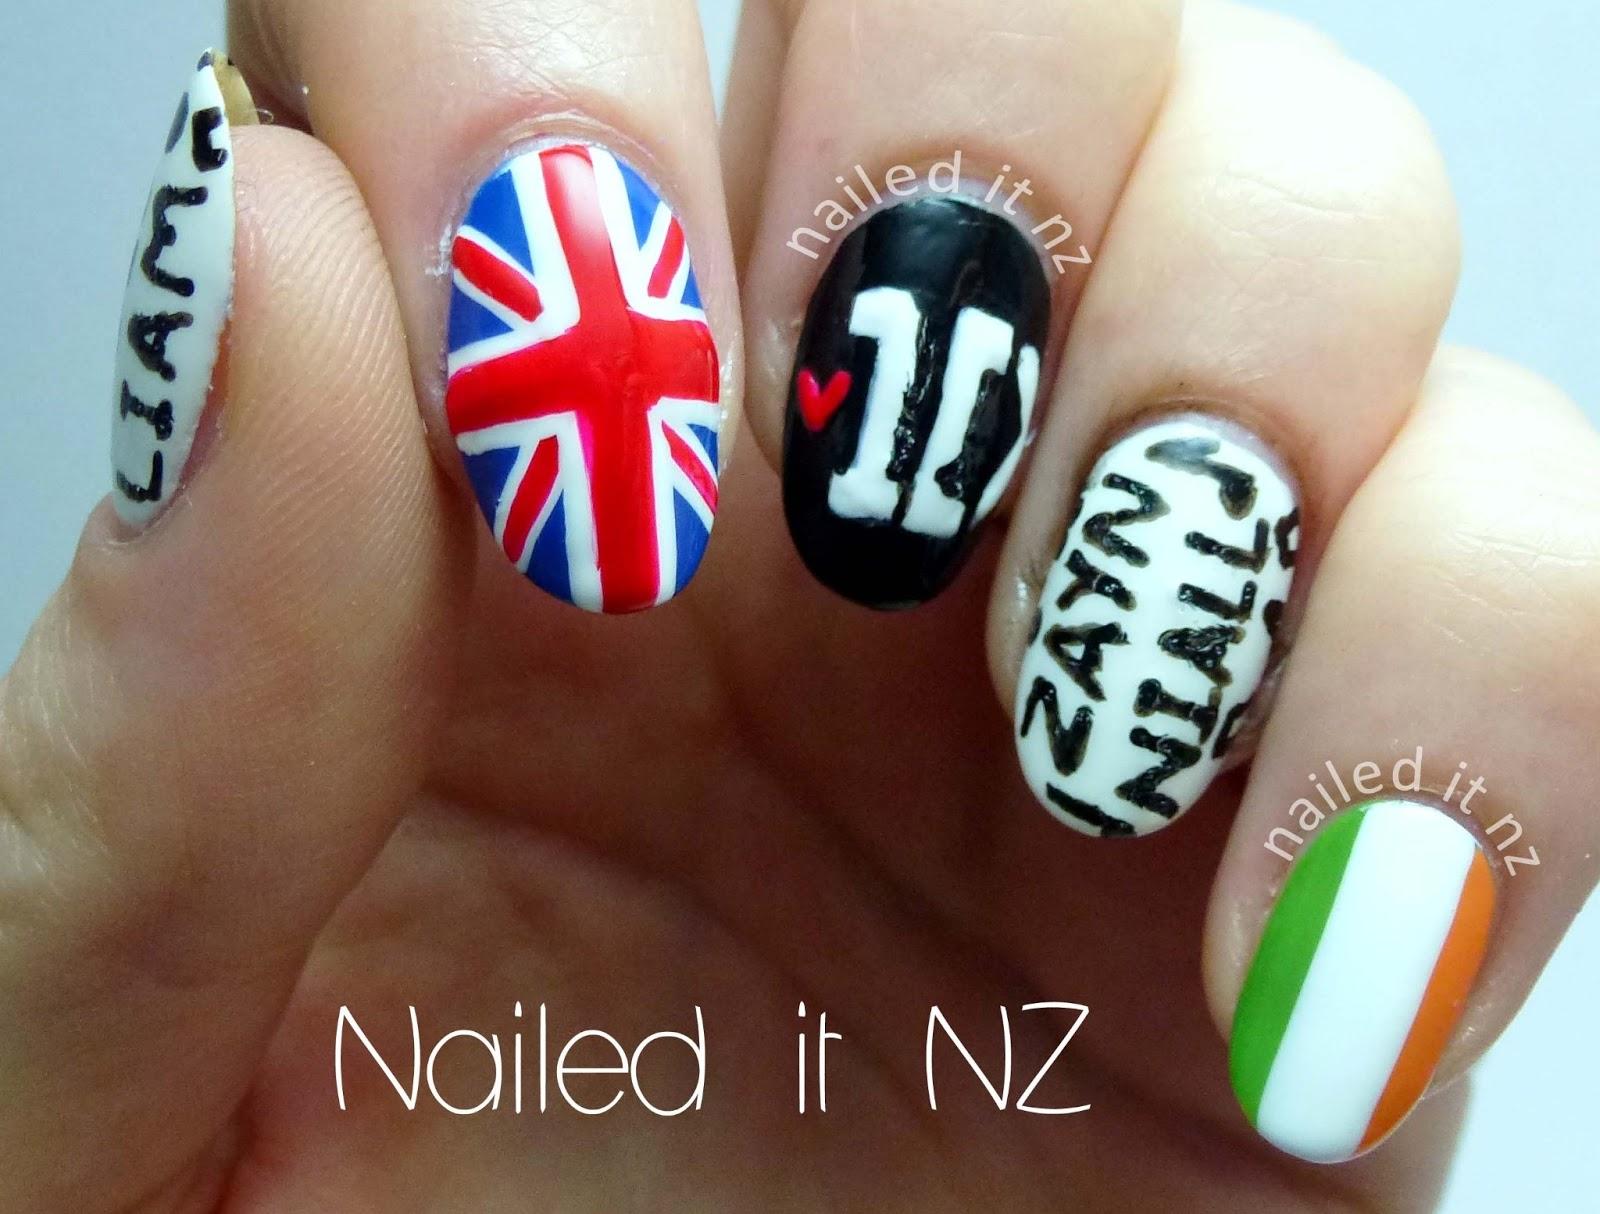 Nailed it nz one direction nail art finally